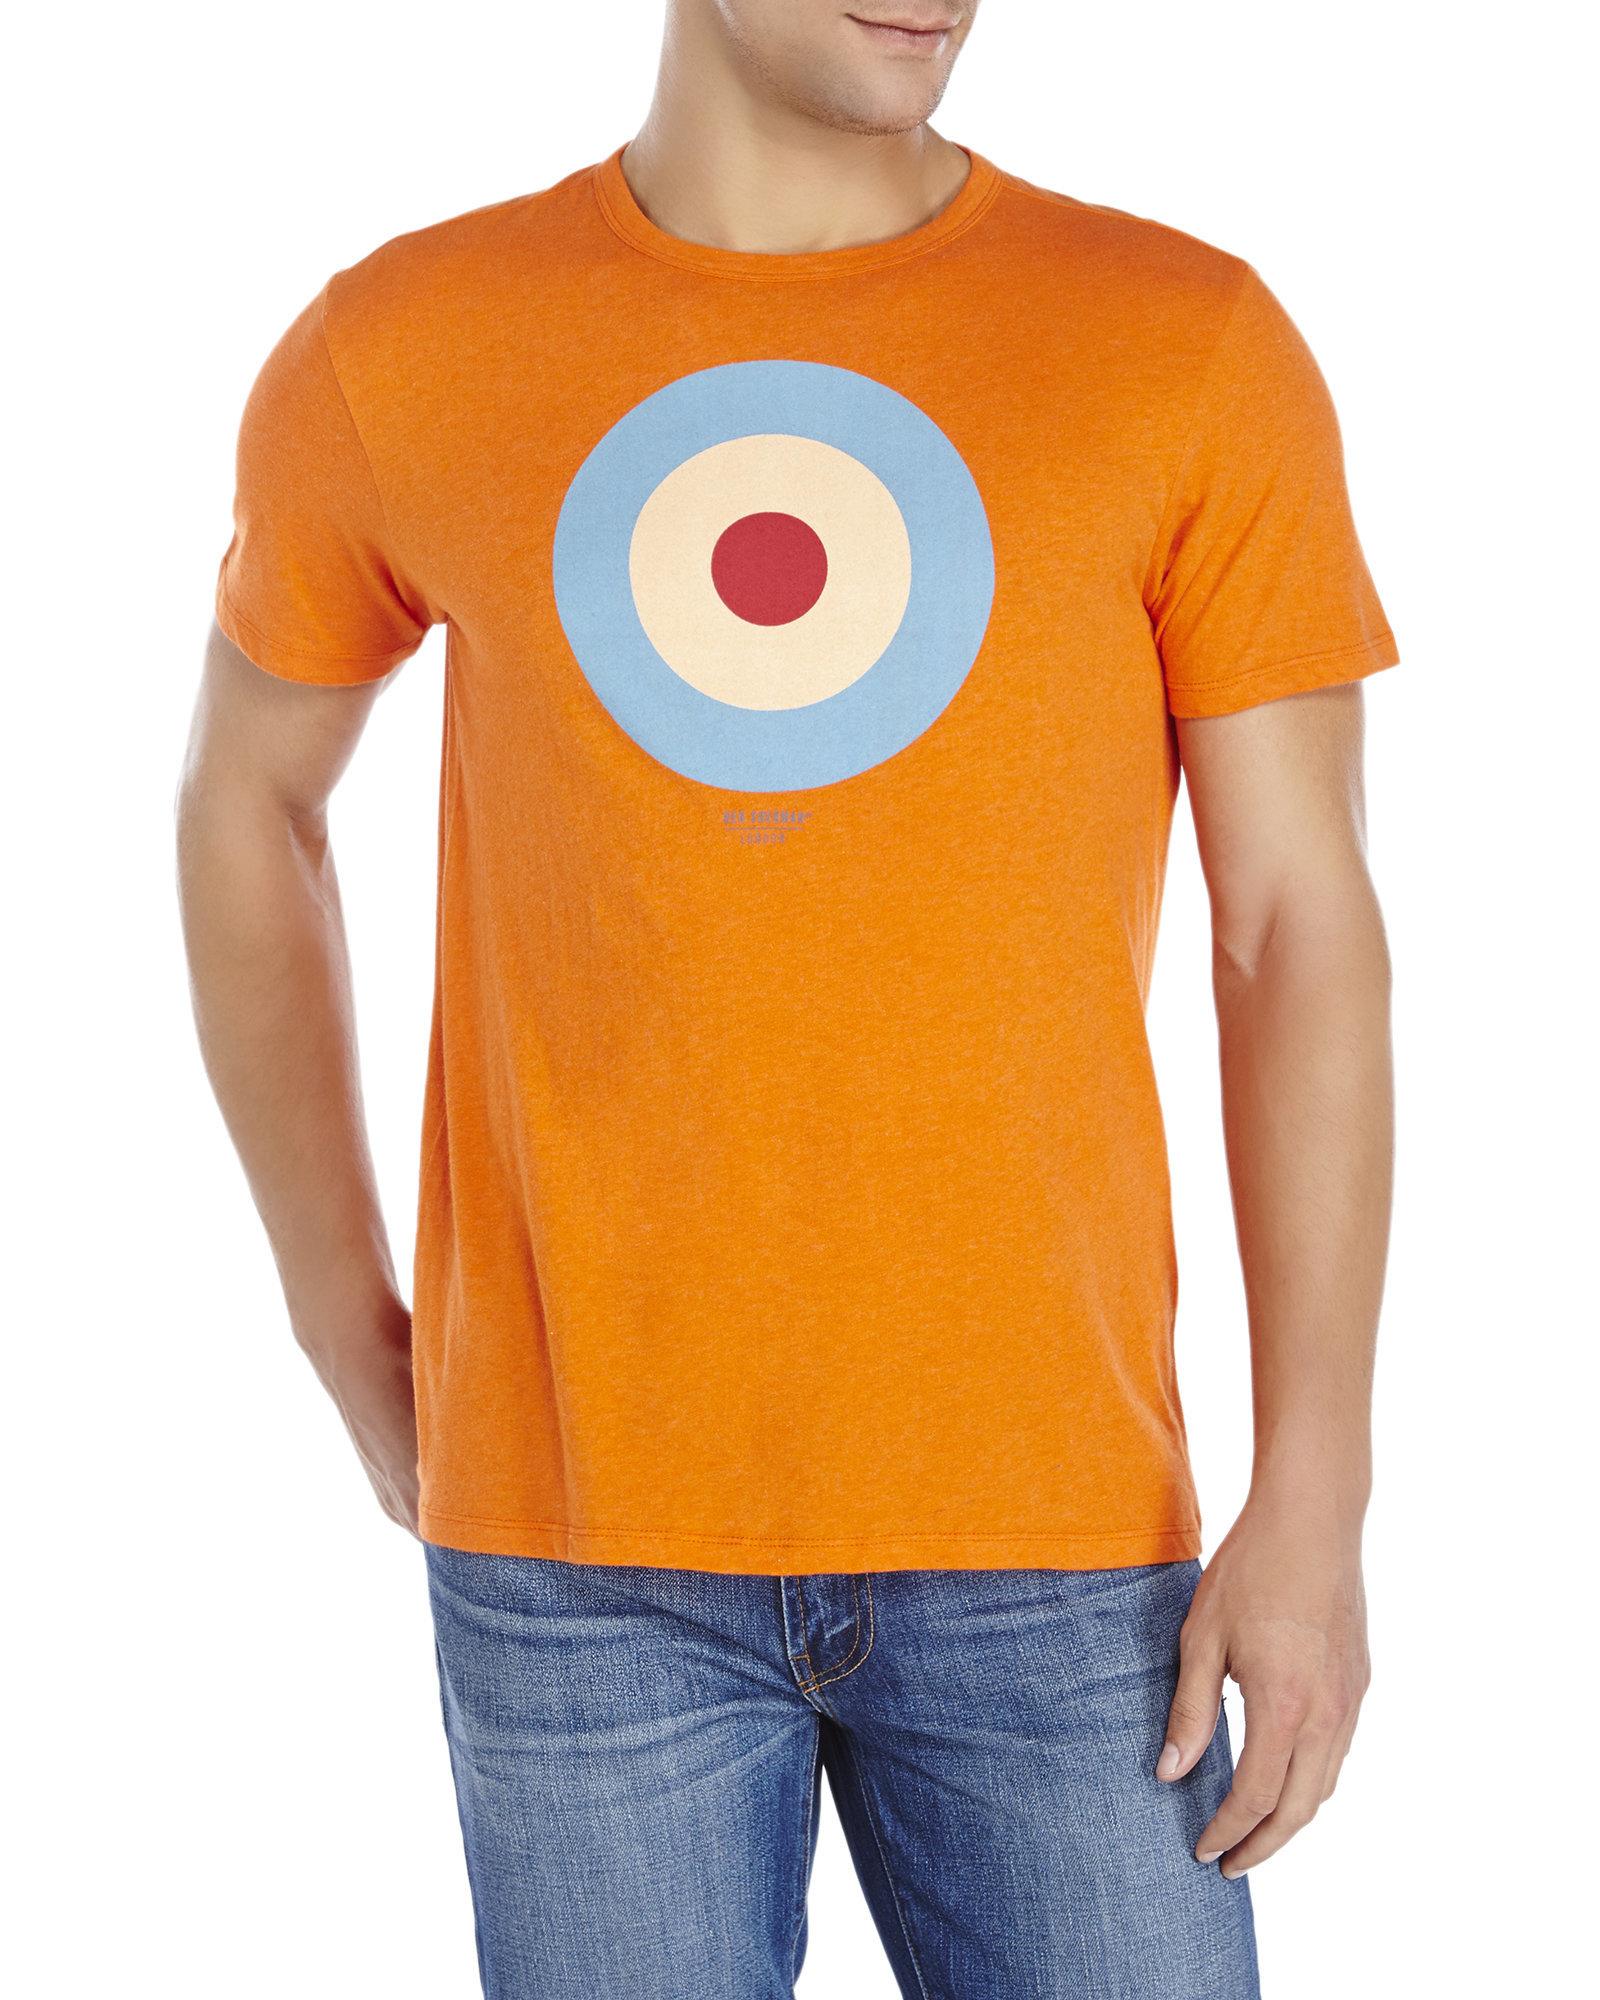 16c34e8c Lyst - Ben Sherman Deep Coral Target Tee in Orange for Men